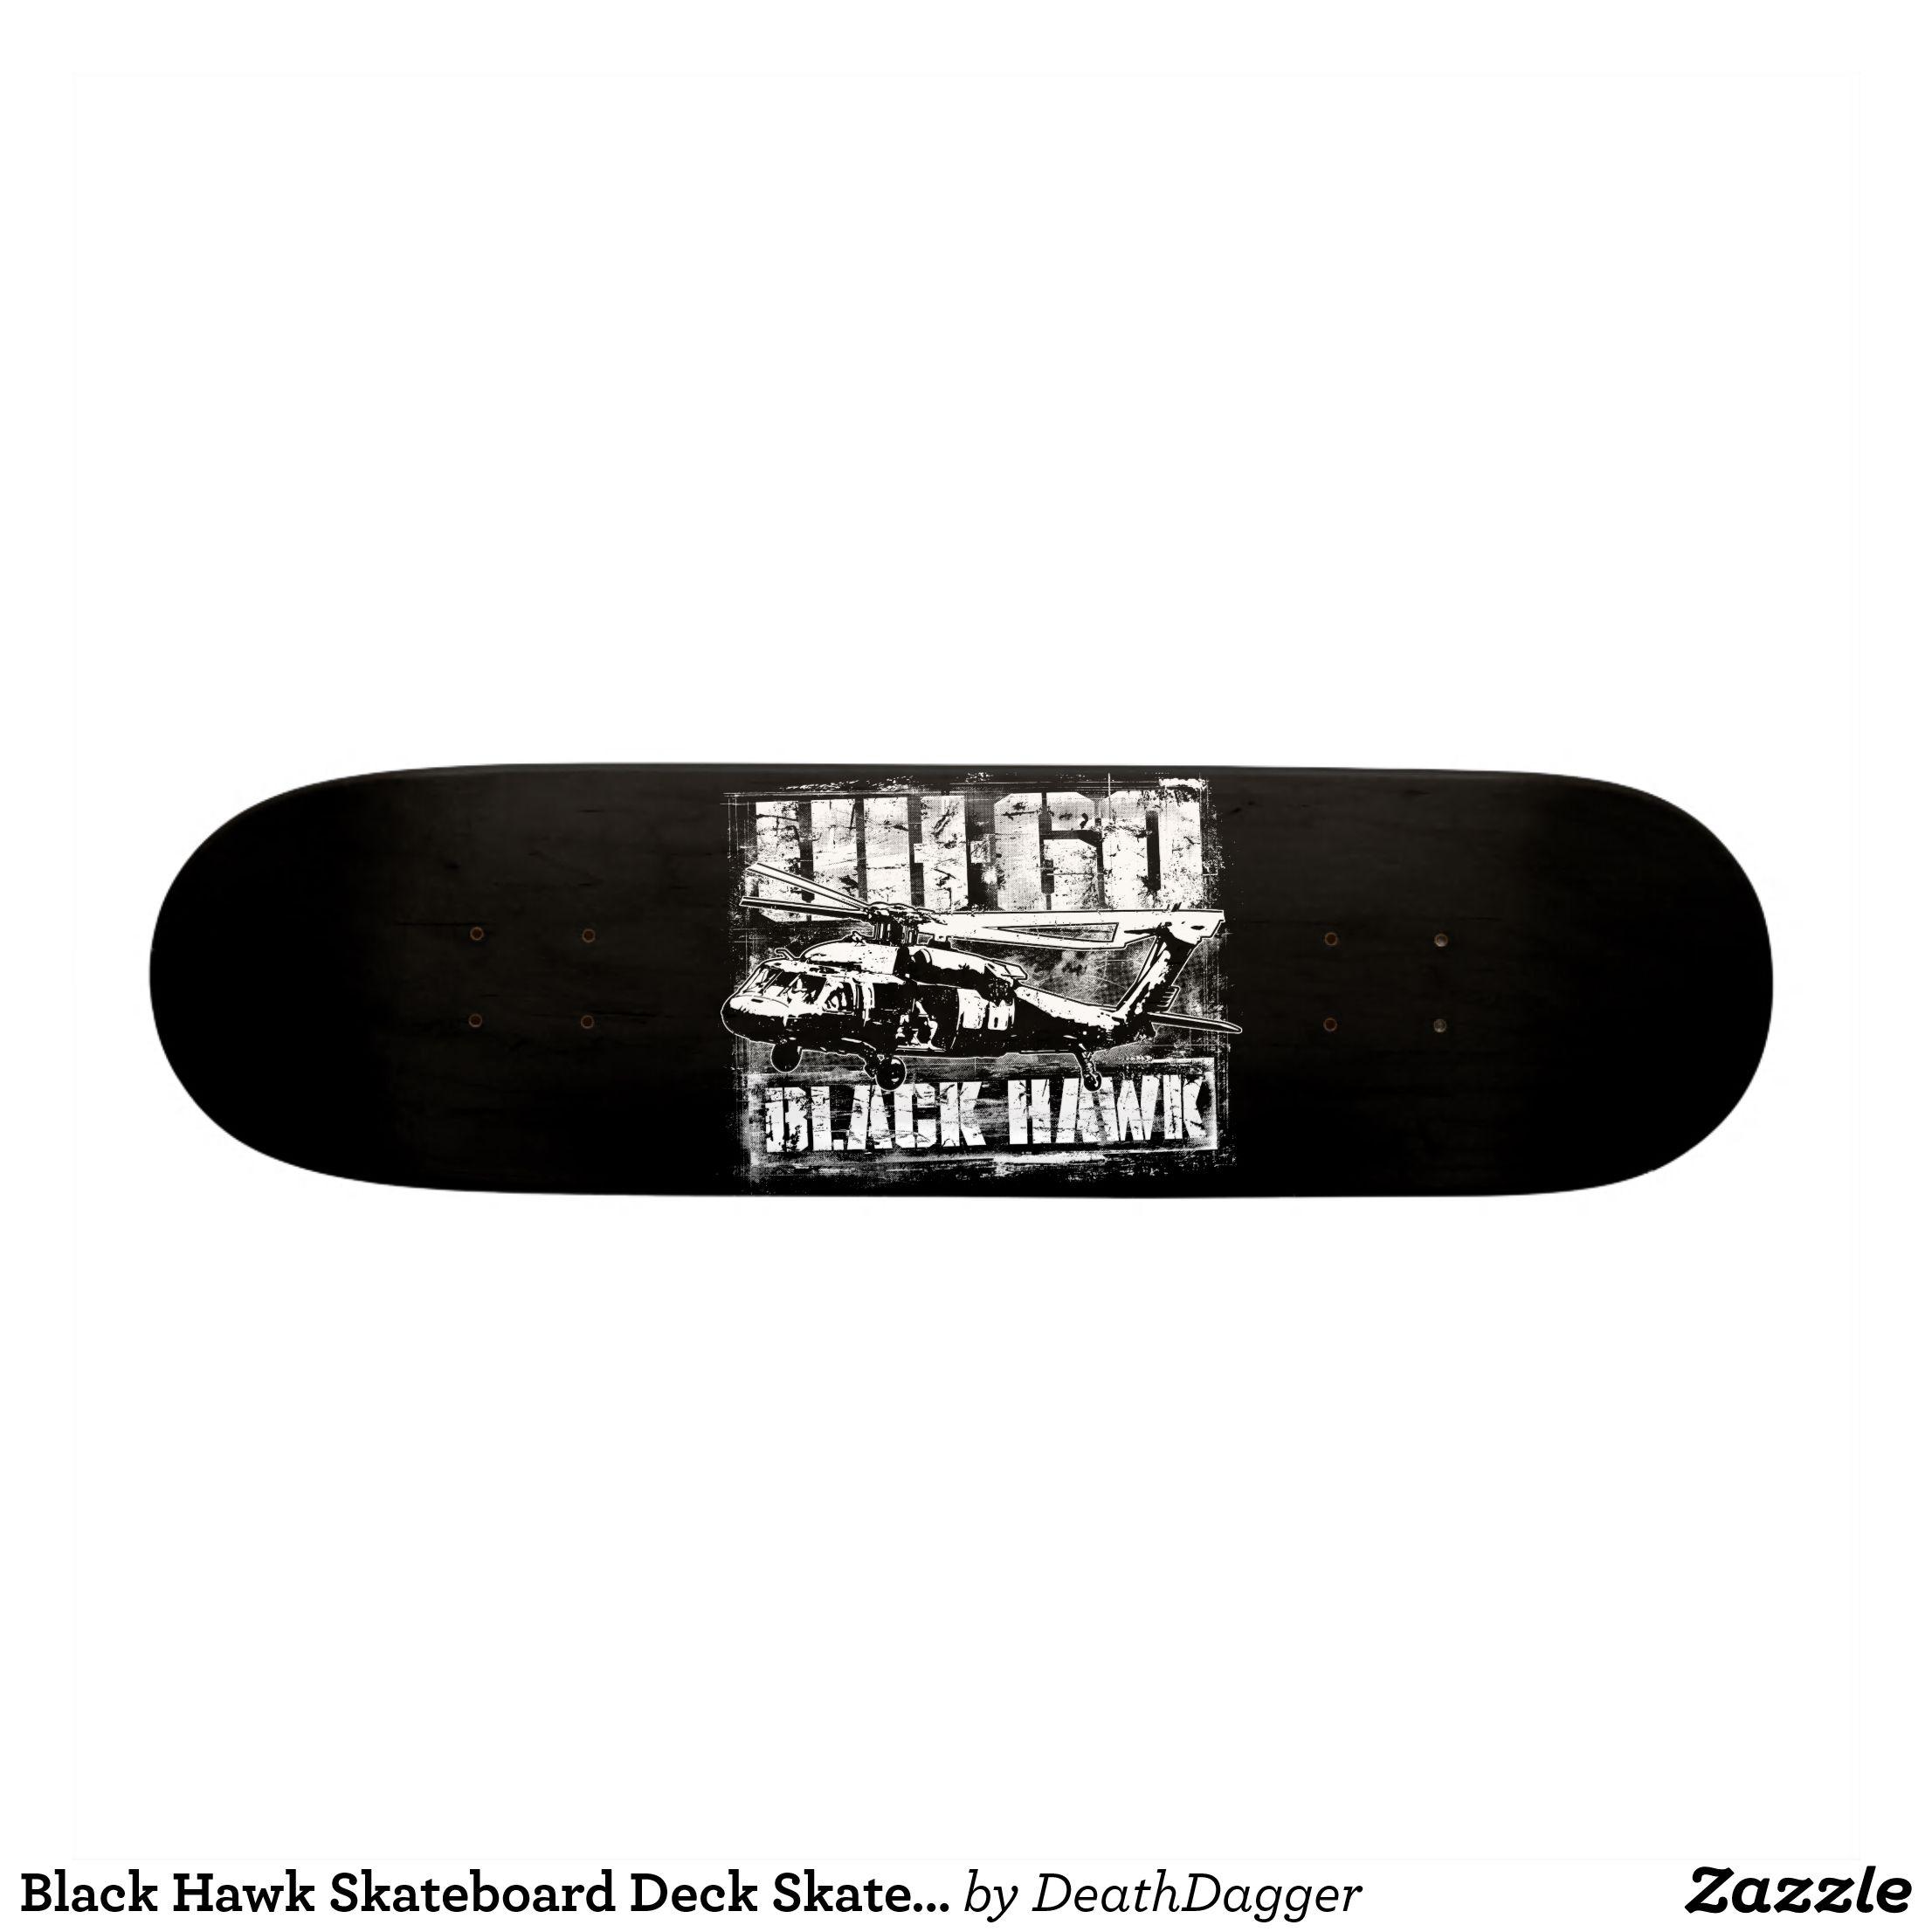 Black Hawk Skateboard Deck Skateboard Supreme Har Skateboard